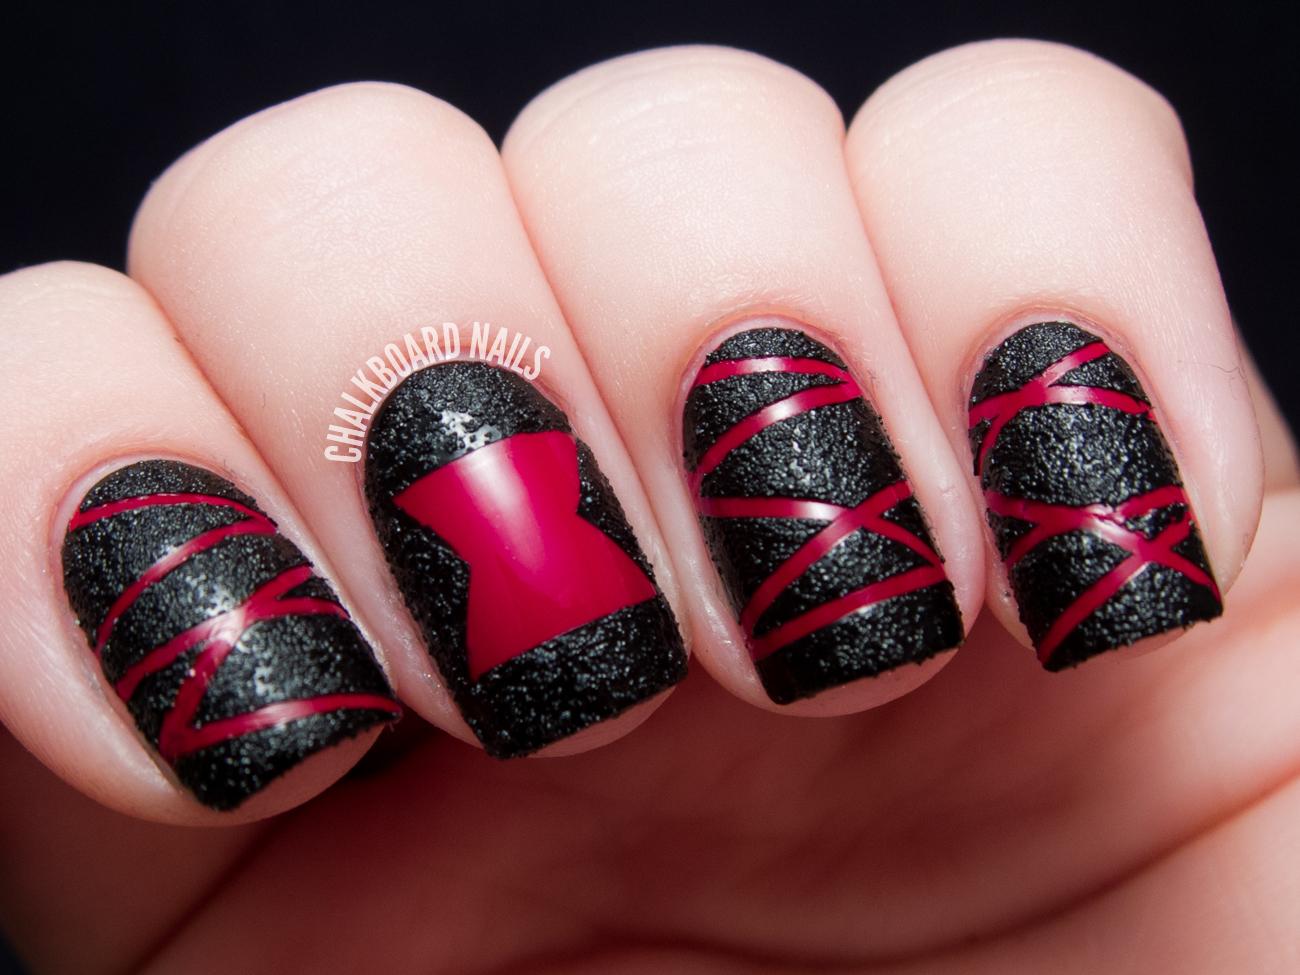 blackwidow-nailart-textured-4 Nail Art Black @bookmarkpages.info